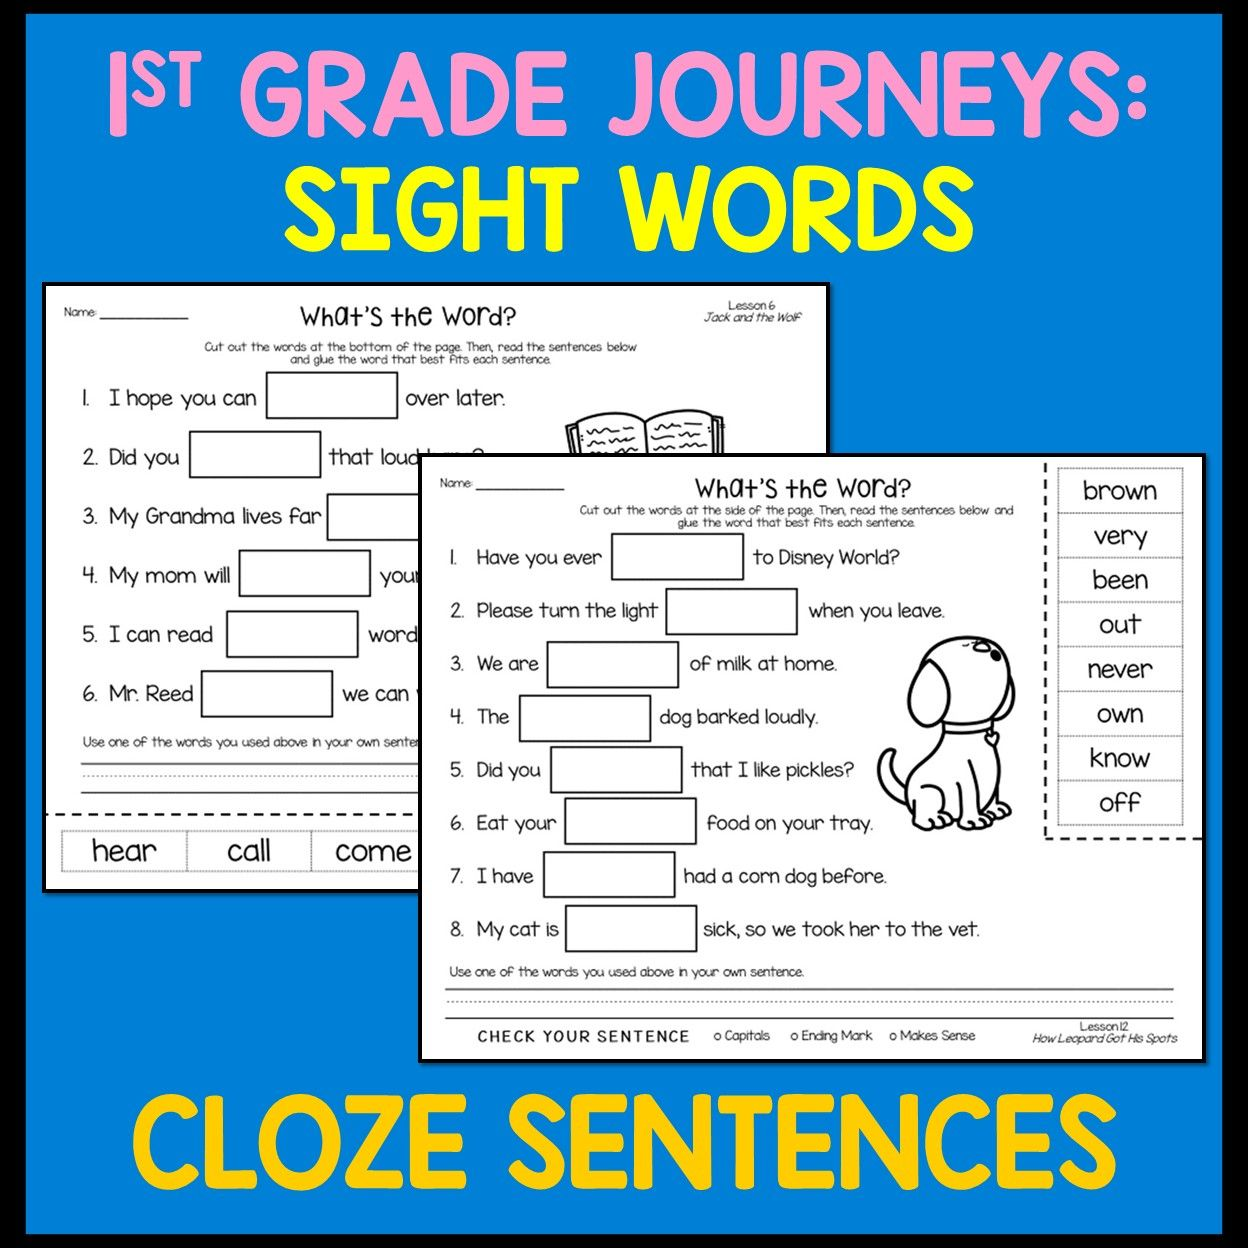 medium resolution of Cloze Sentences for 1st Grade Journeys Sight Words   Sight words